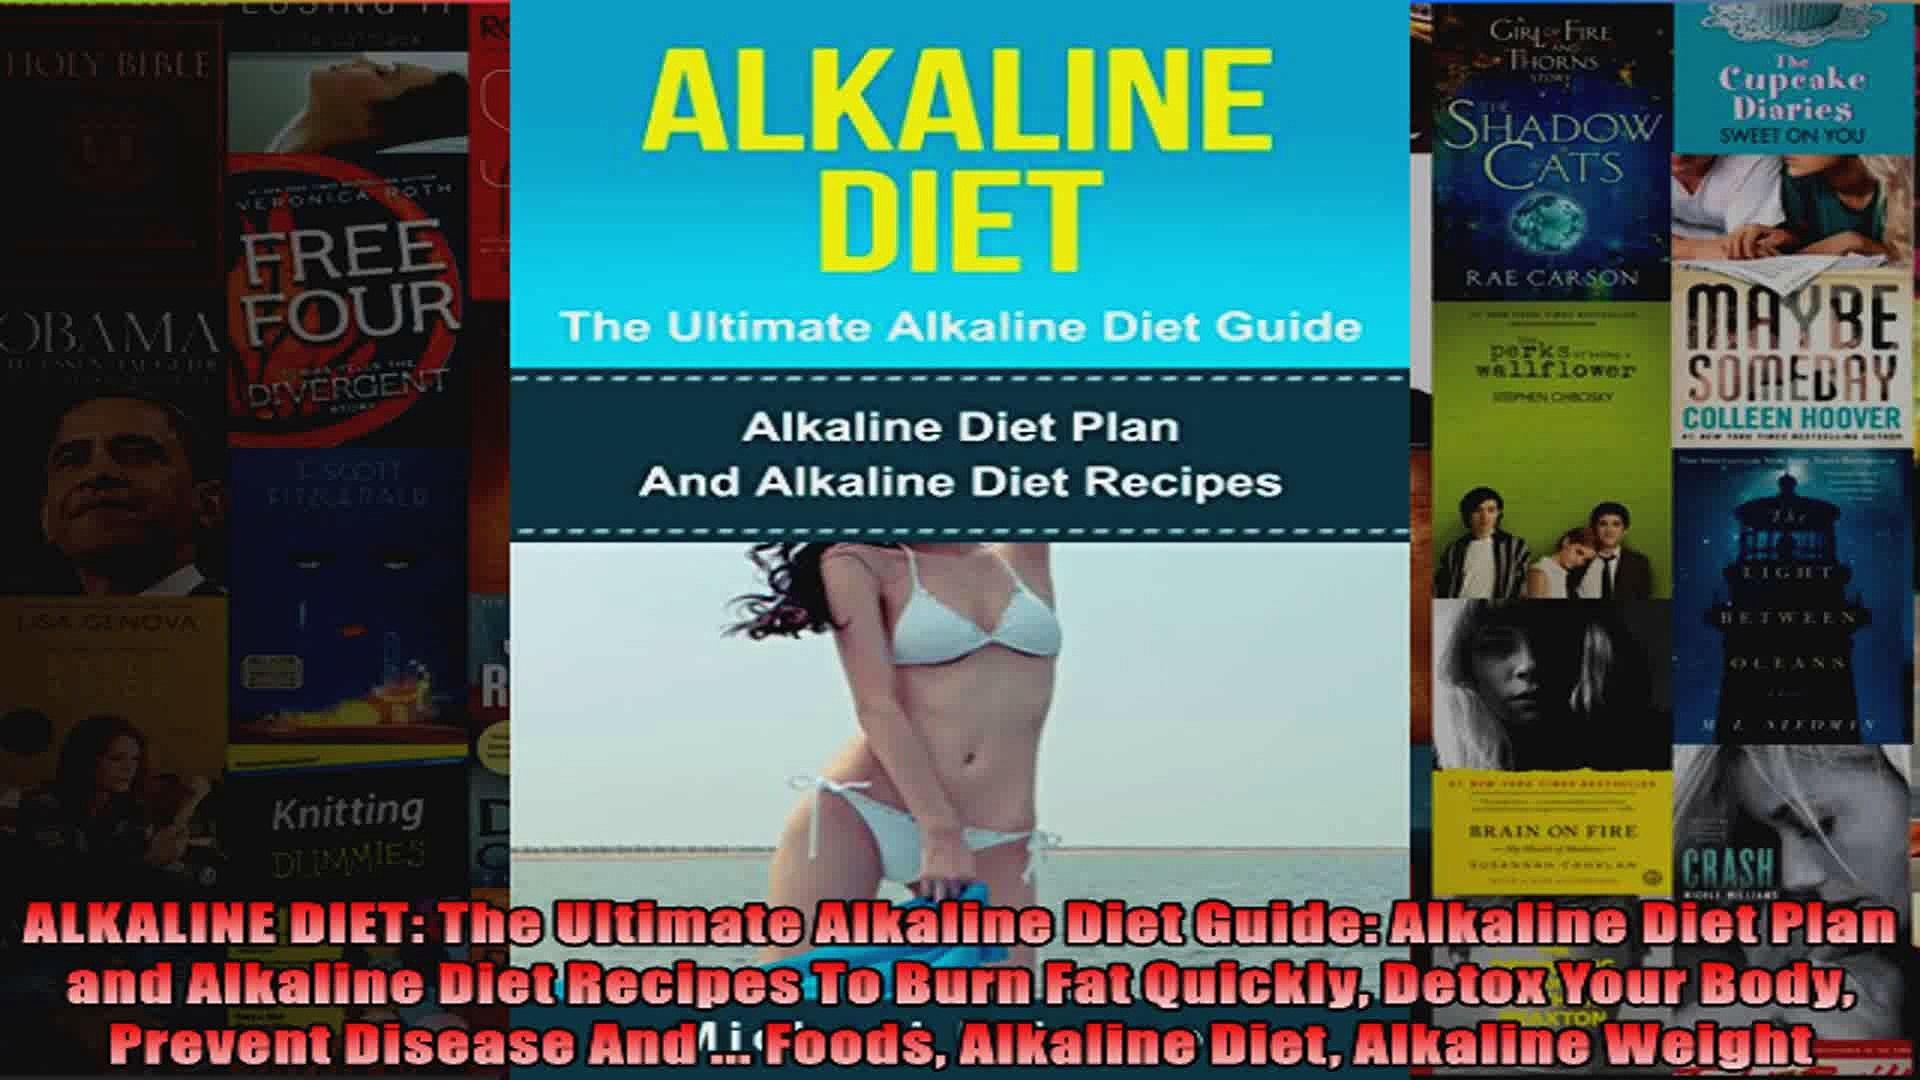 Read  ALKALINE DIET The Ultimate Alkaline Diet Guide Alkaline Diet Plan and Alkaline Diet  Full EBoo